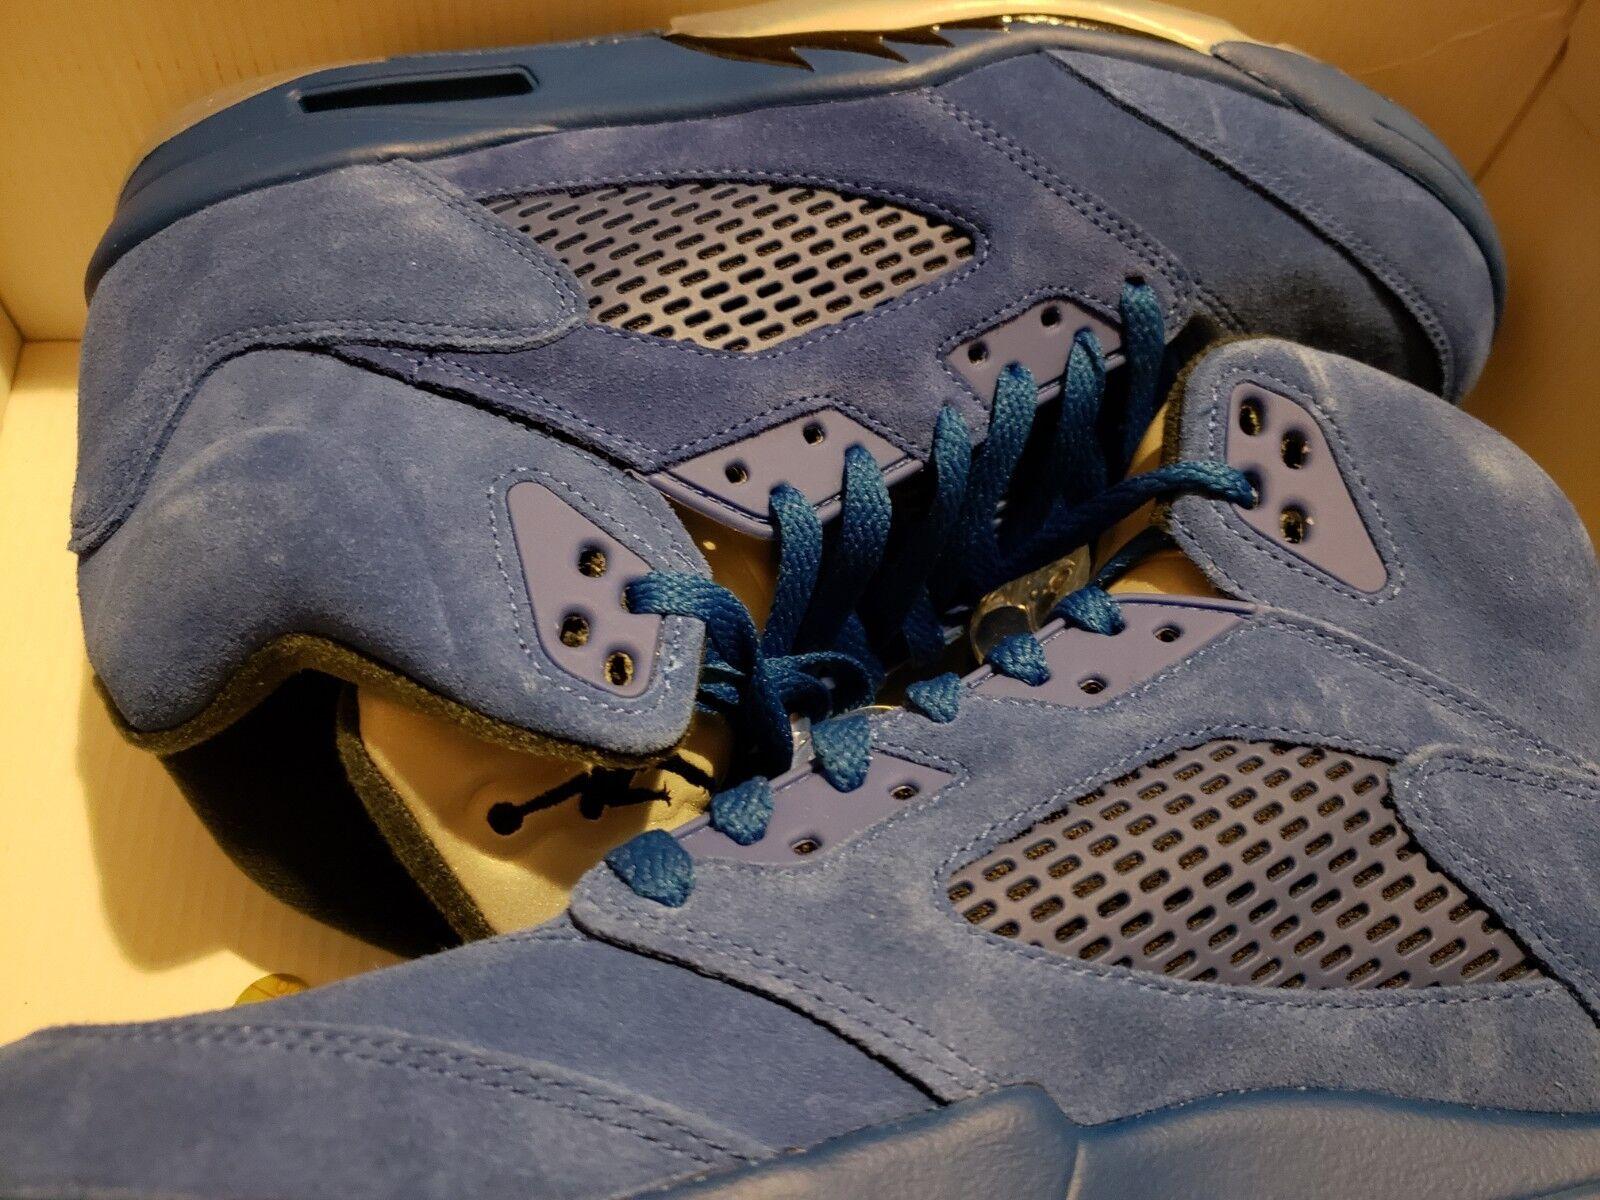 size 40 e86b3 a2d29 Nike Air Jordan 5 V bluee Suede Size 11 Game Game Game Royal Black 136027-